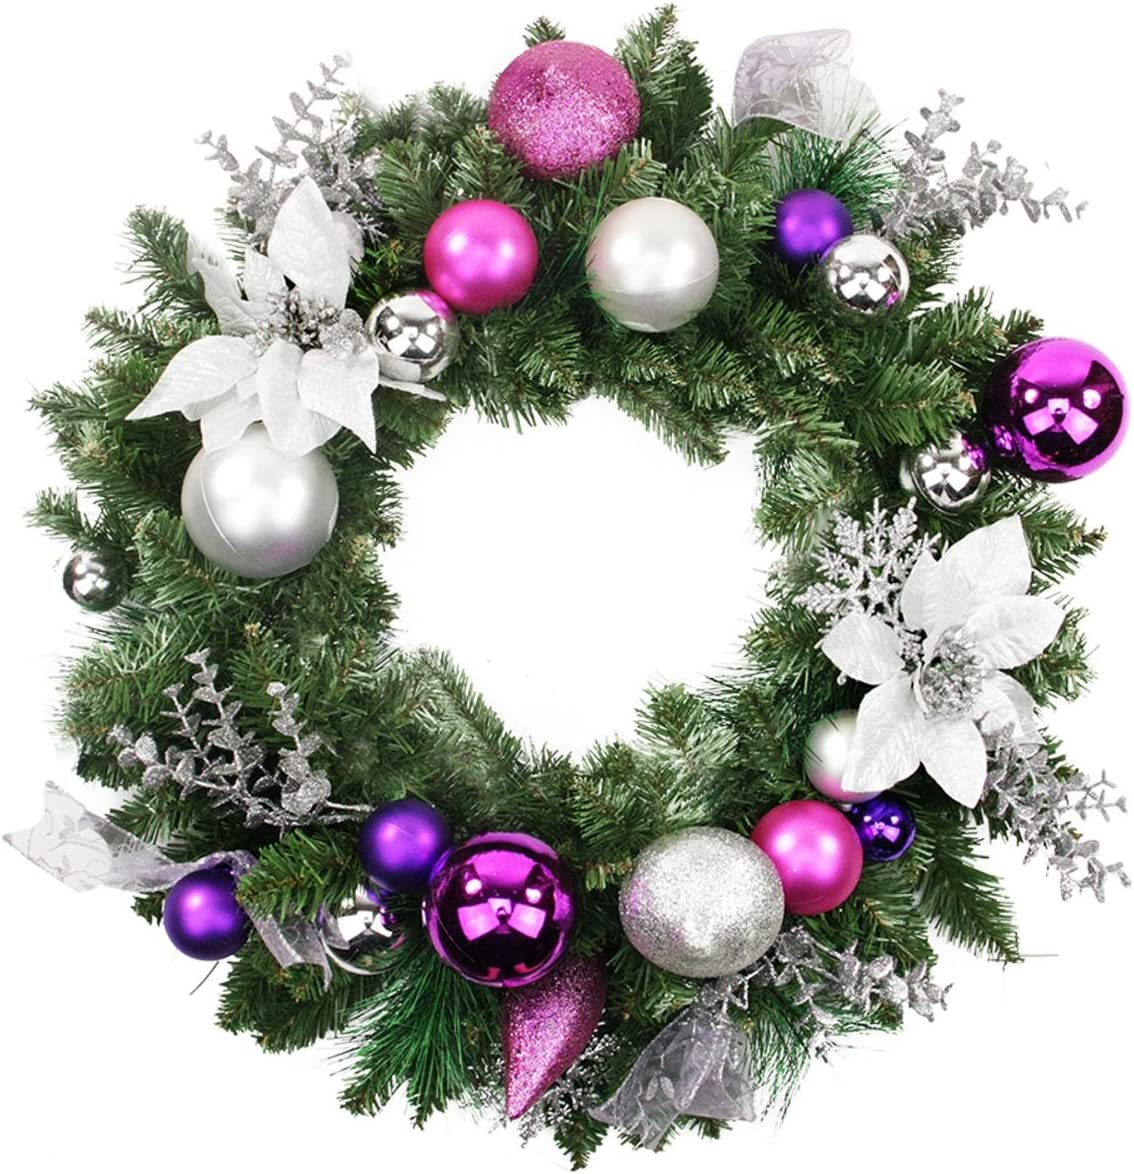 Amazon Com Northlight Poinsettia And Eucalyptus Artificial Christmas Wreath Purple Silver 24 Inch Unlit Home Kitchen